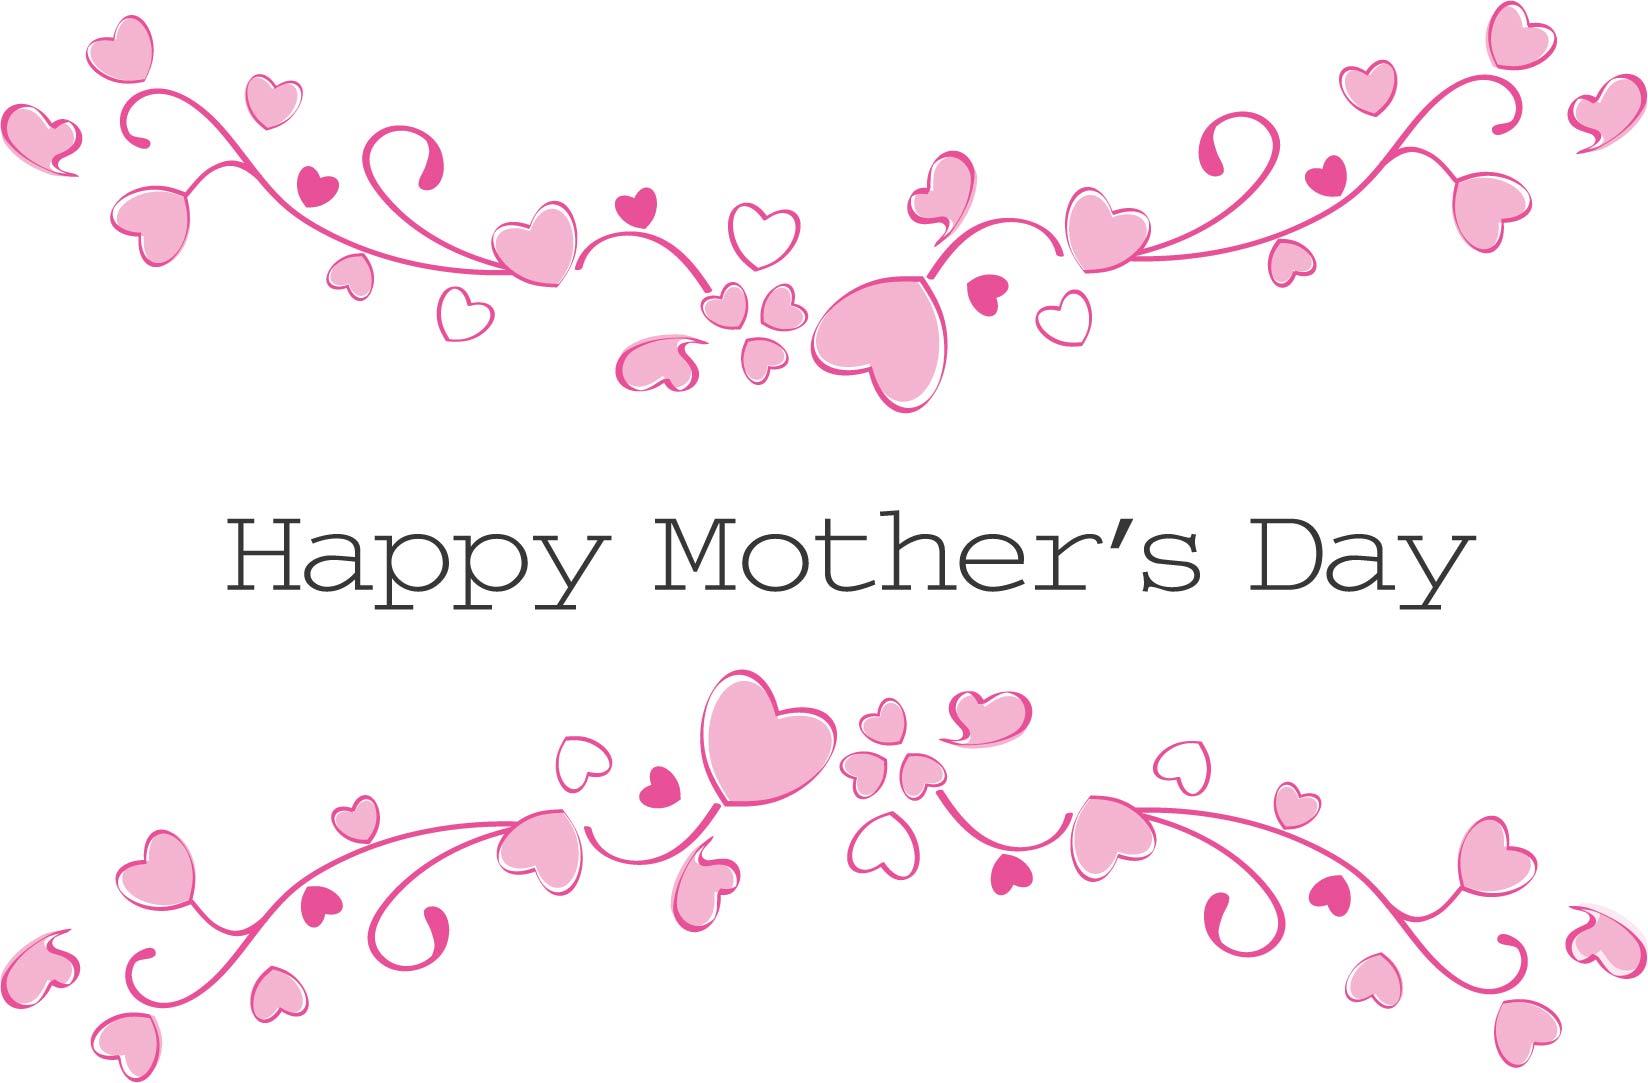 Mother Day , عيد الأم, يوم الأم, , صور عيد الأم